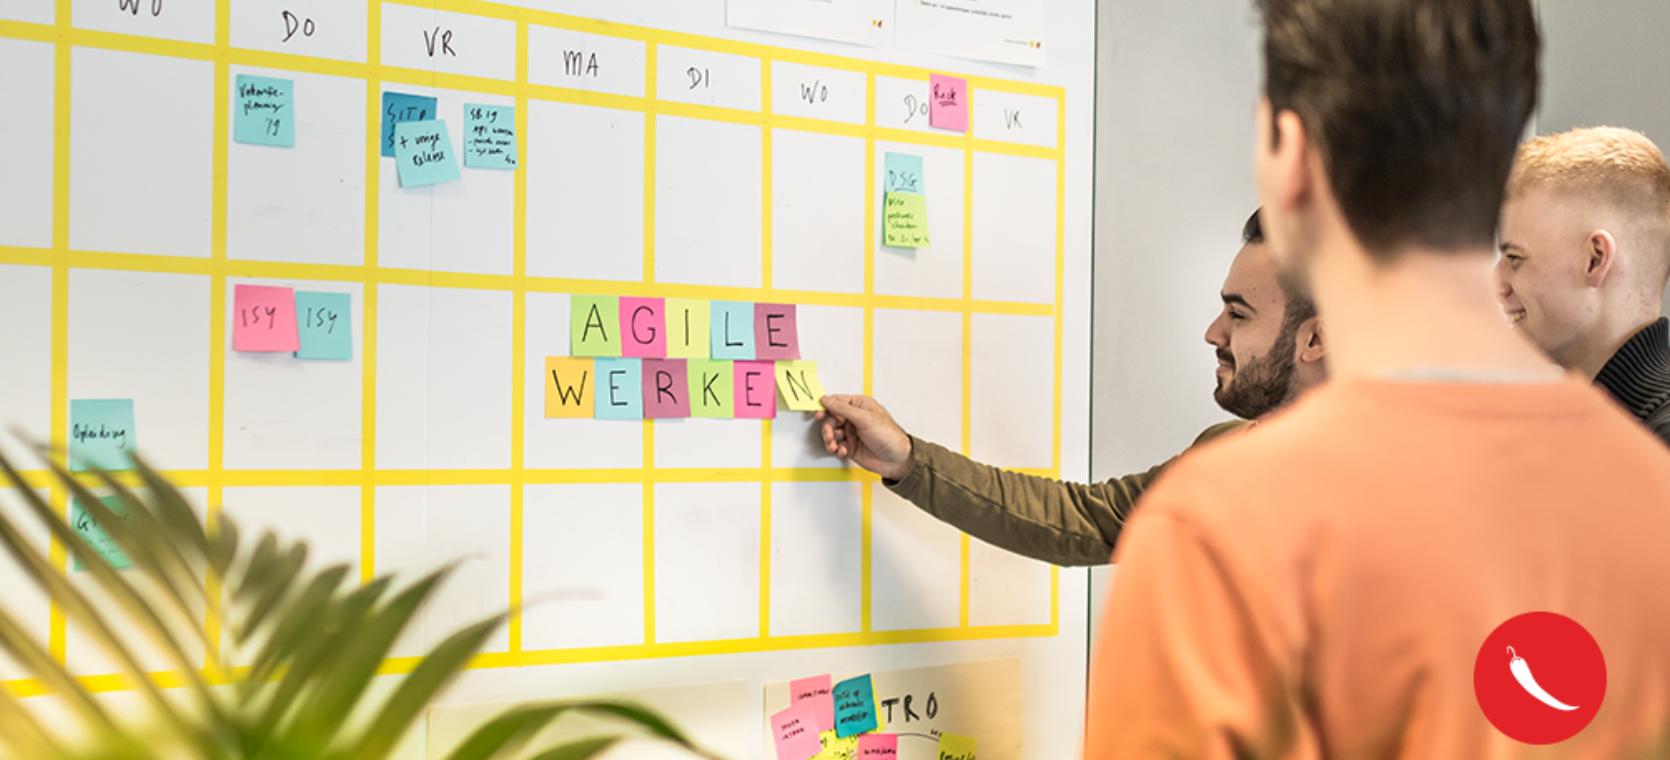 Headers 1004px website ketjapp agile werken